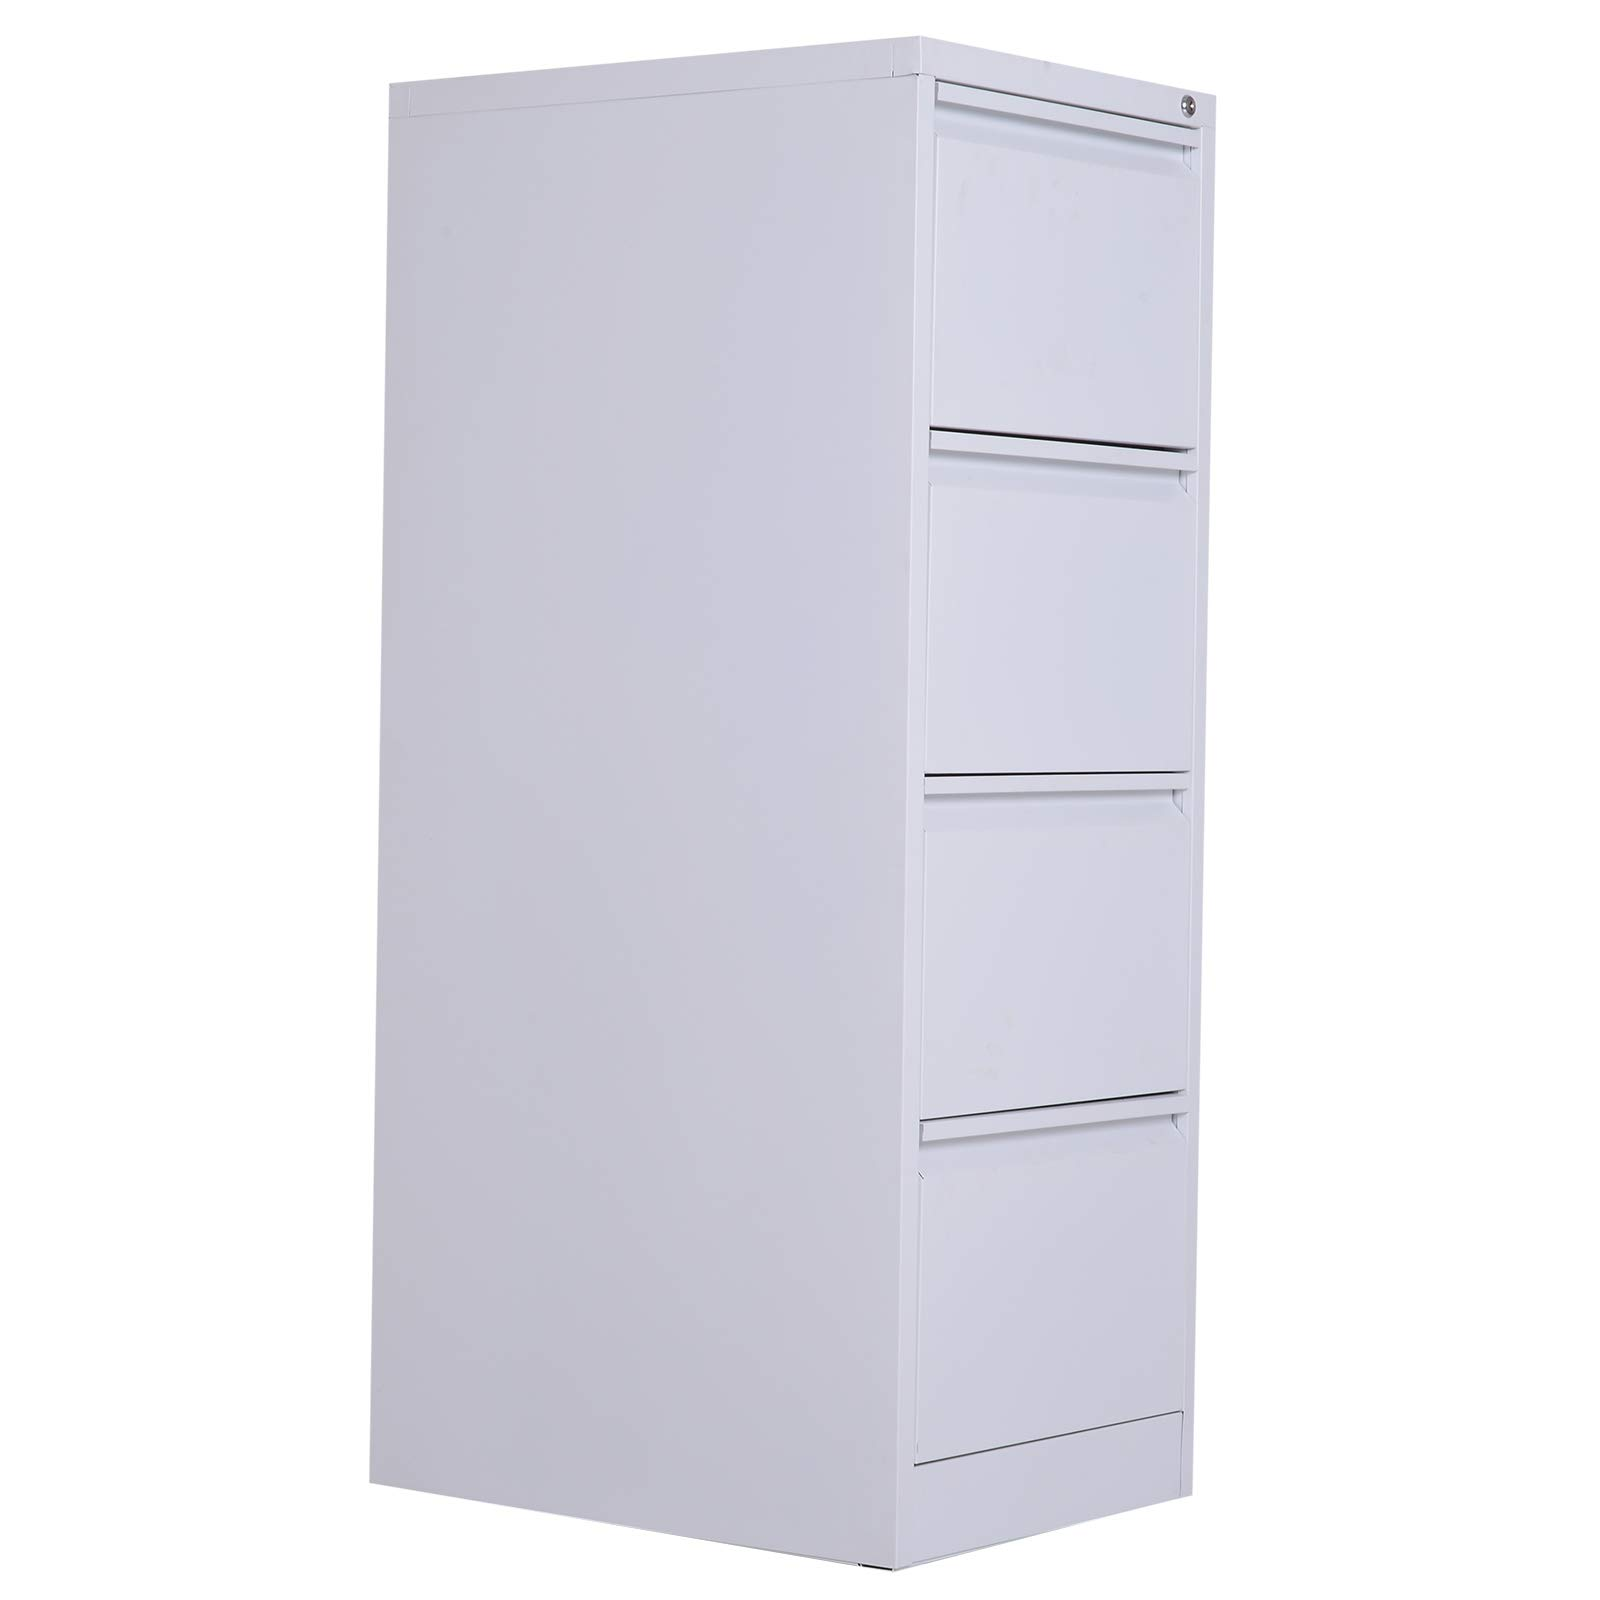 Vinsetto Metal 4 Drawer Vertical Locking Filing Cabinet - White